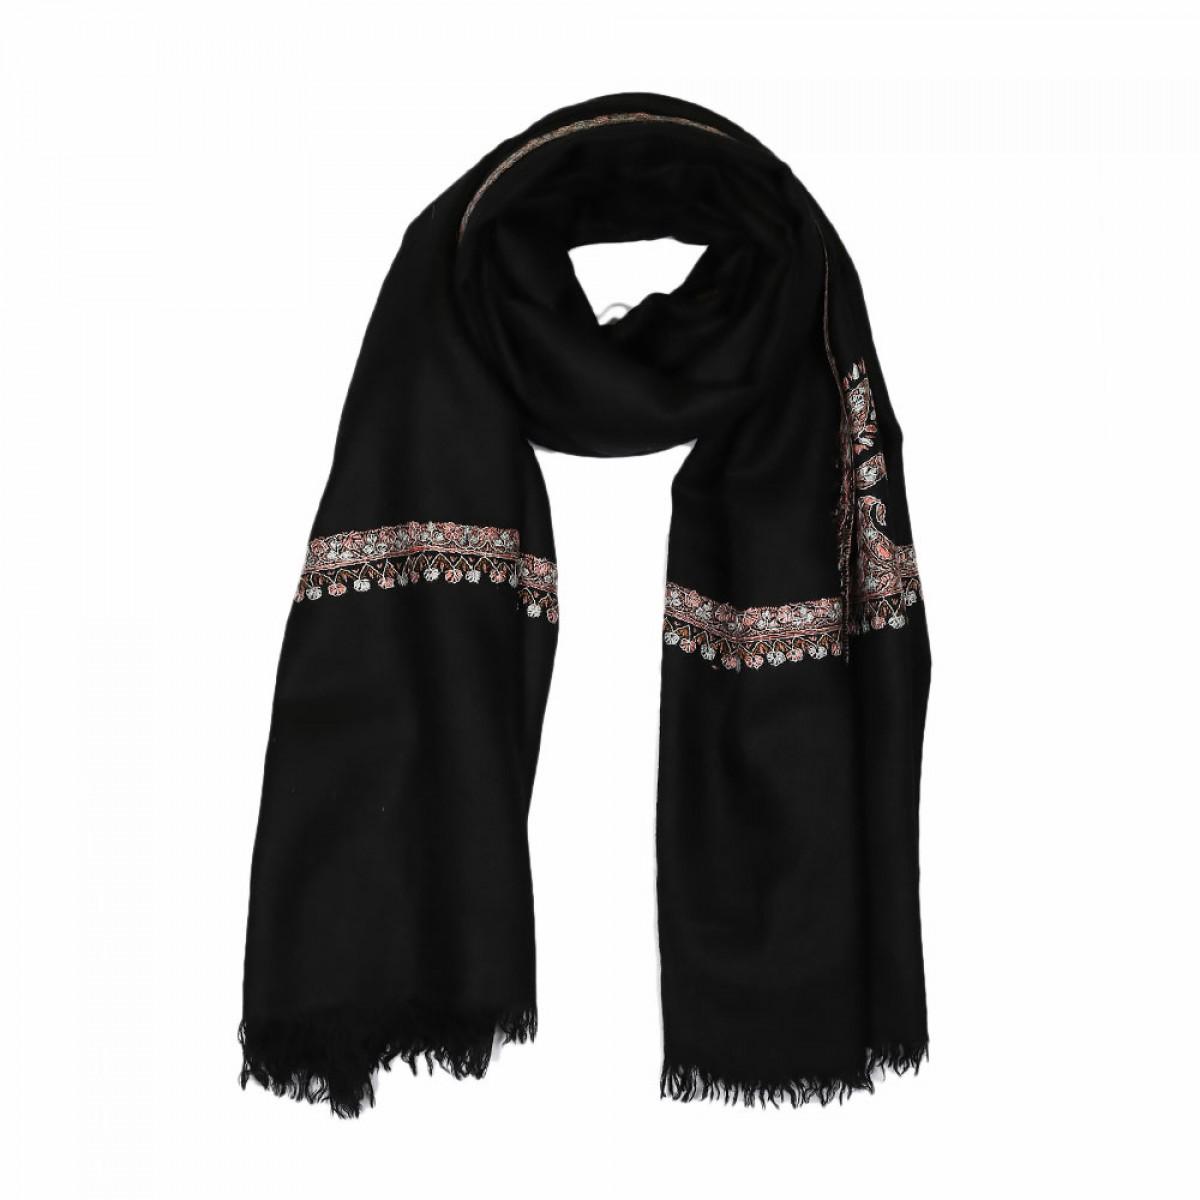 Embroidered Handloom Pashmina Stole - Black Sepia